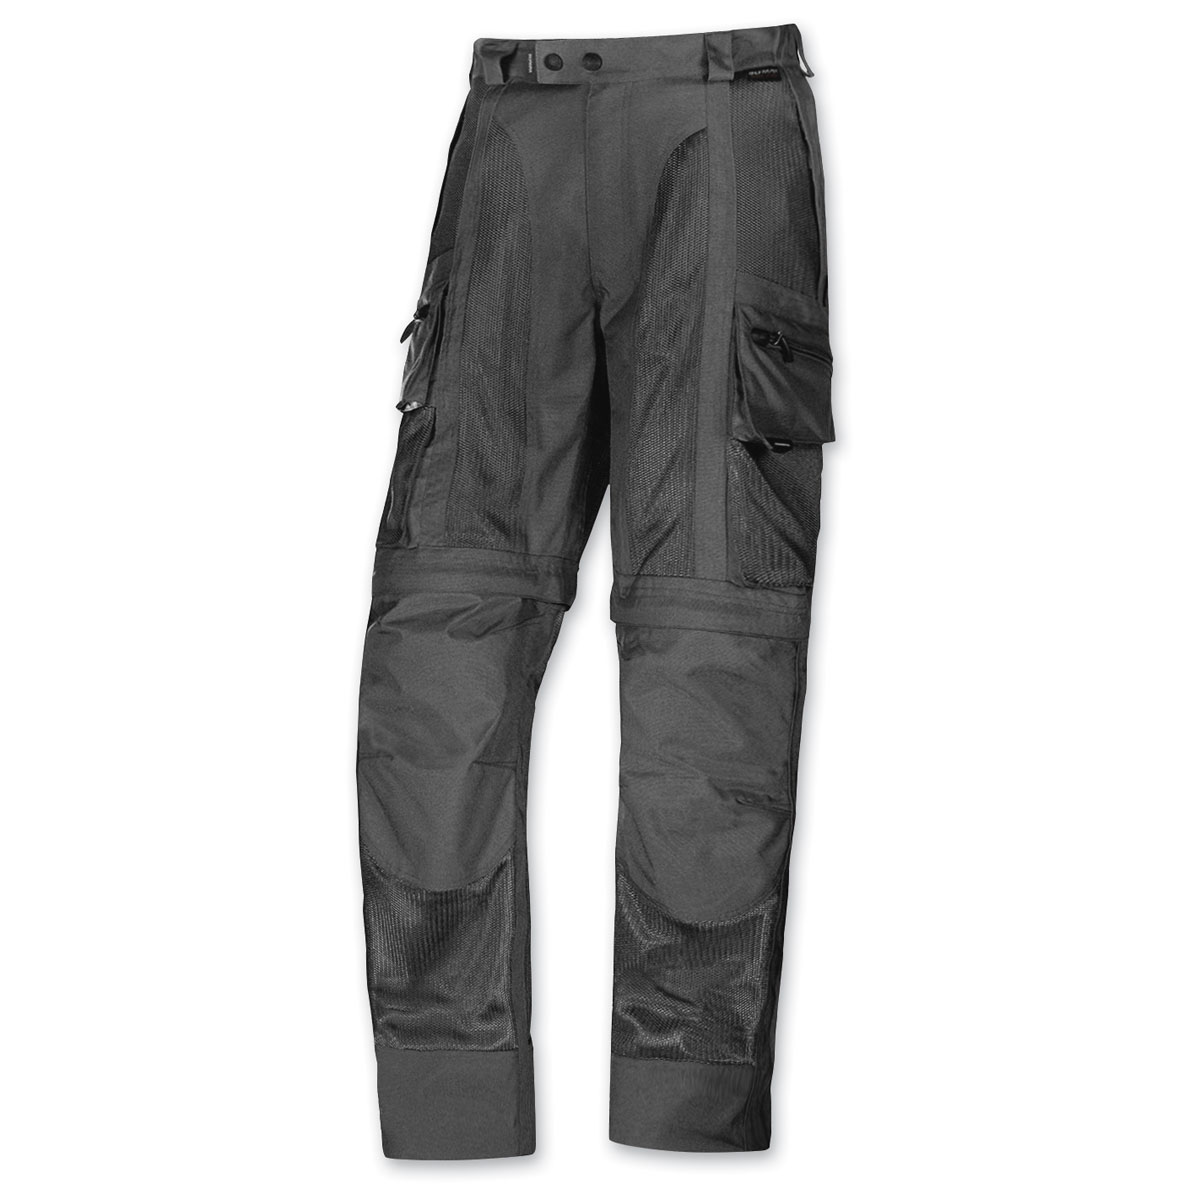 Olympia Moto Sports Men's Dakar Mesh Tech Black Pants